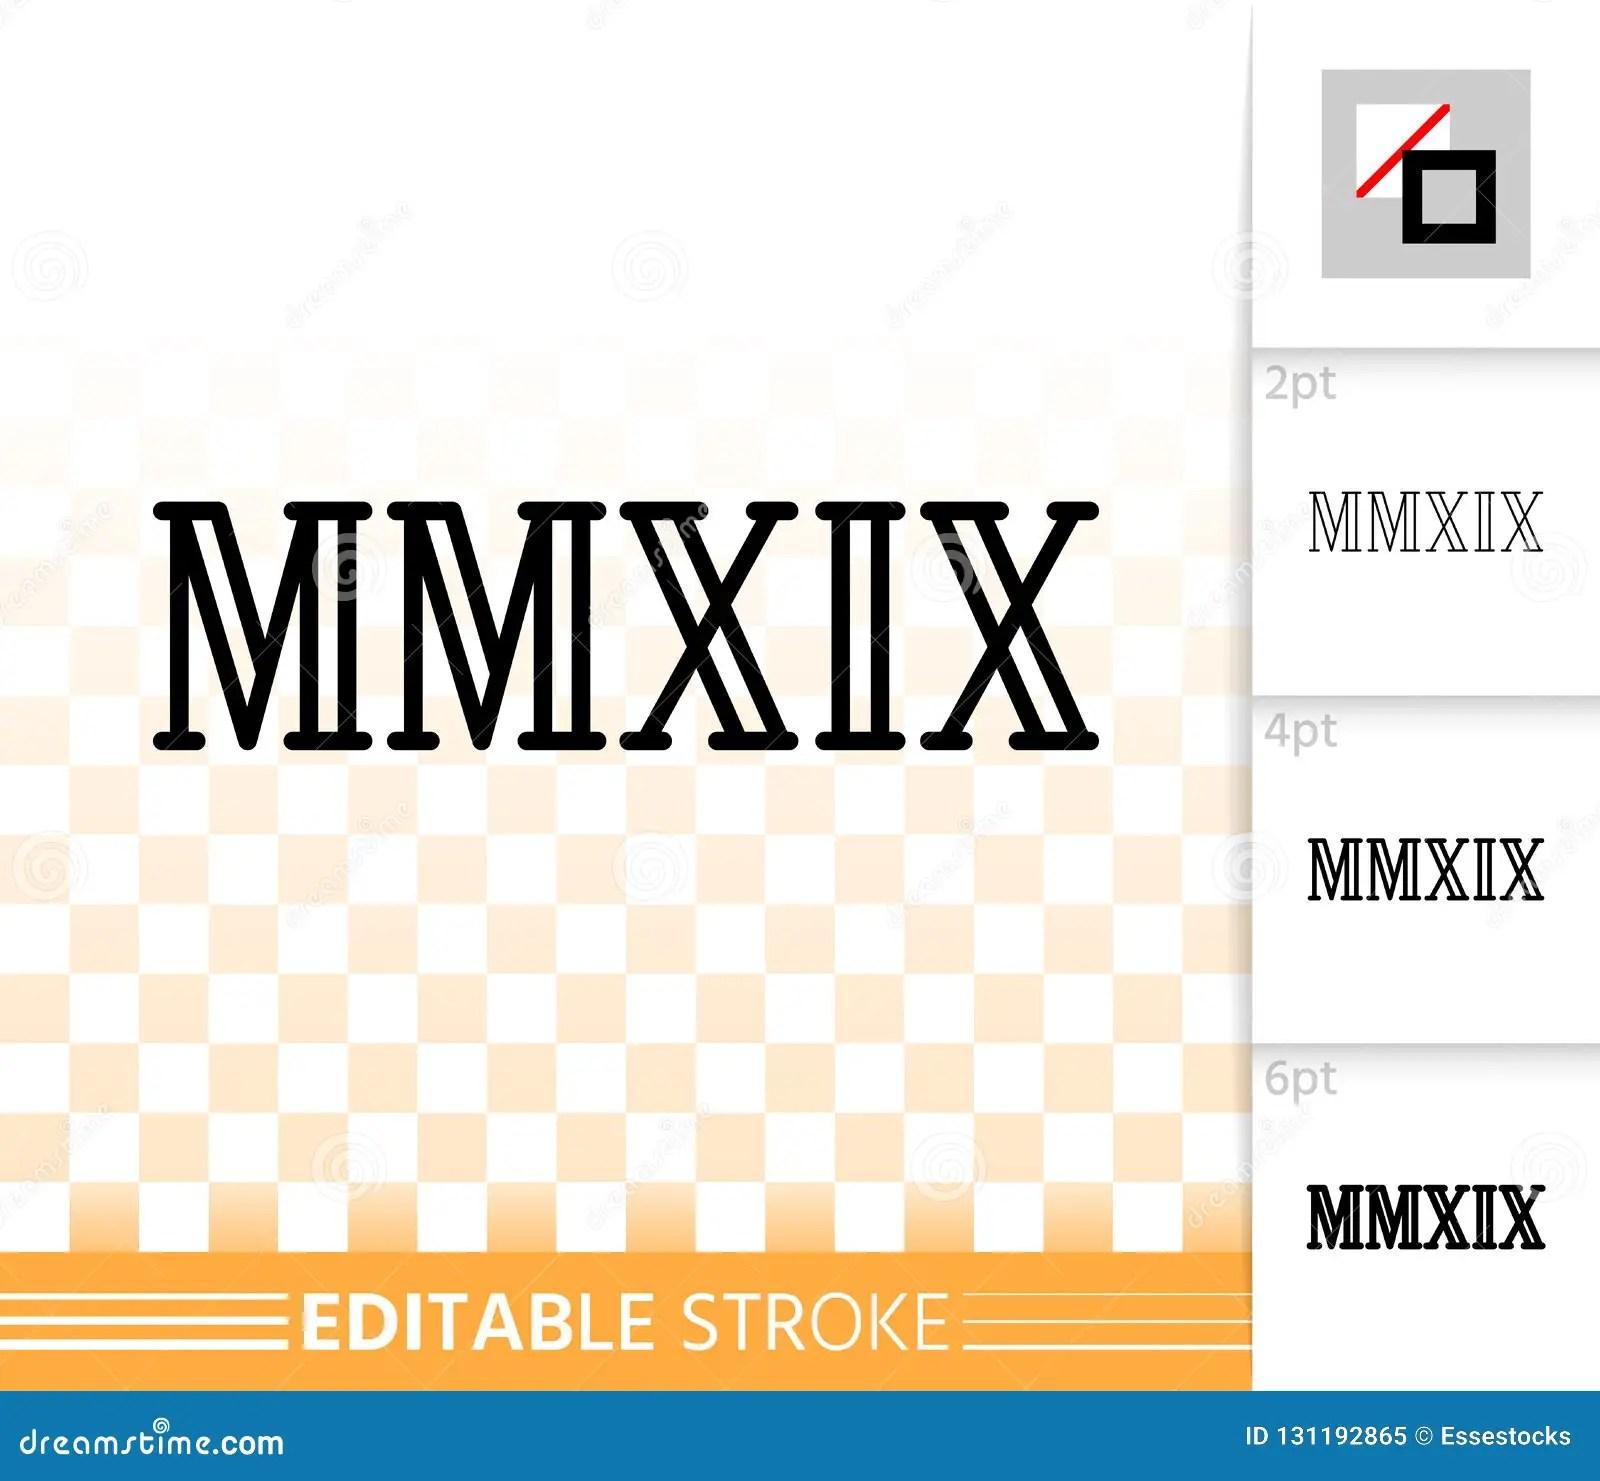 Year Mmxix Simple Black Line Vector Icon Stock Vector